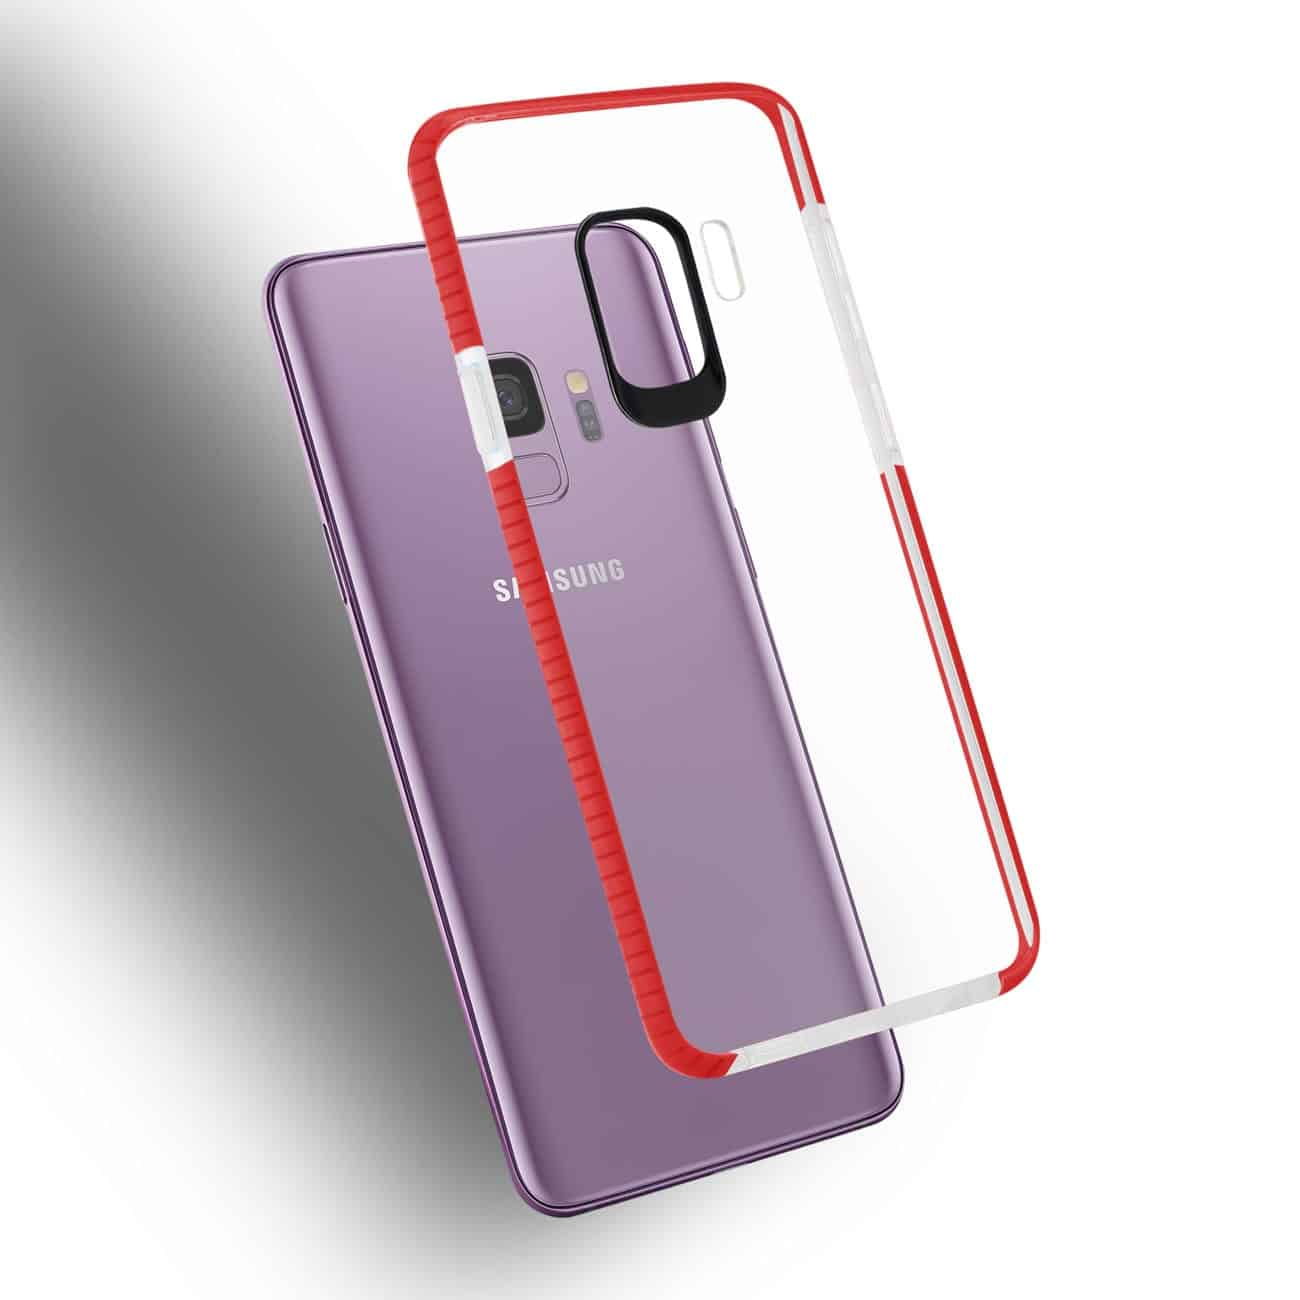 Samsung Galaxy S9 Soft Transparent TPU Case In Clear Red